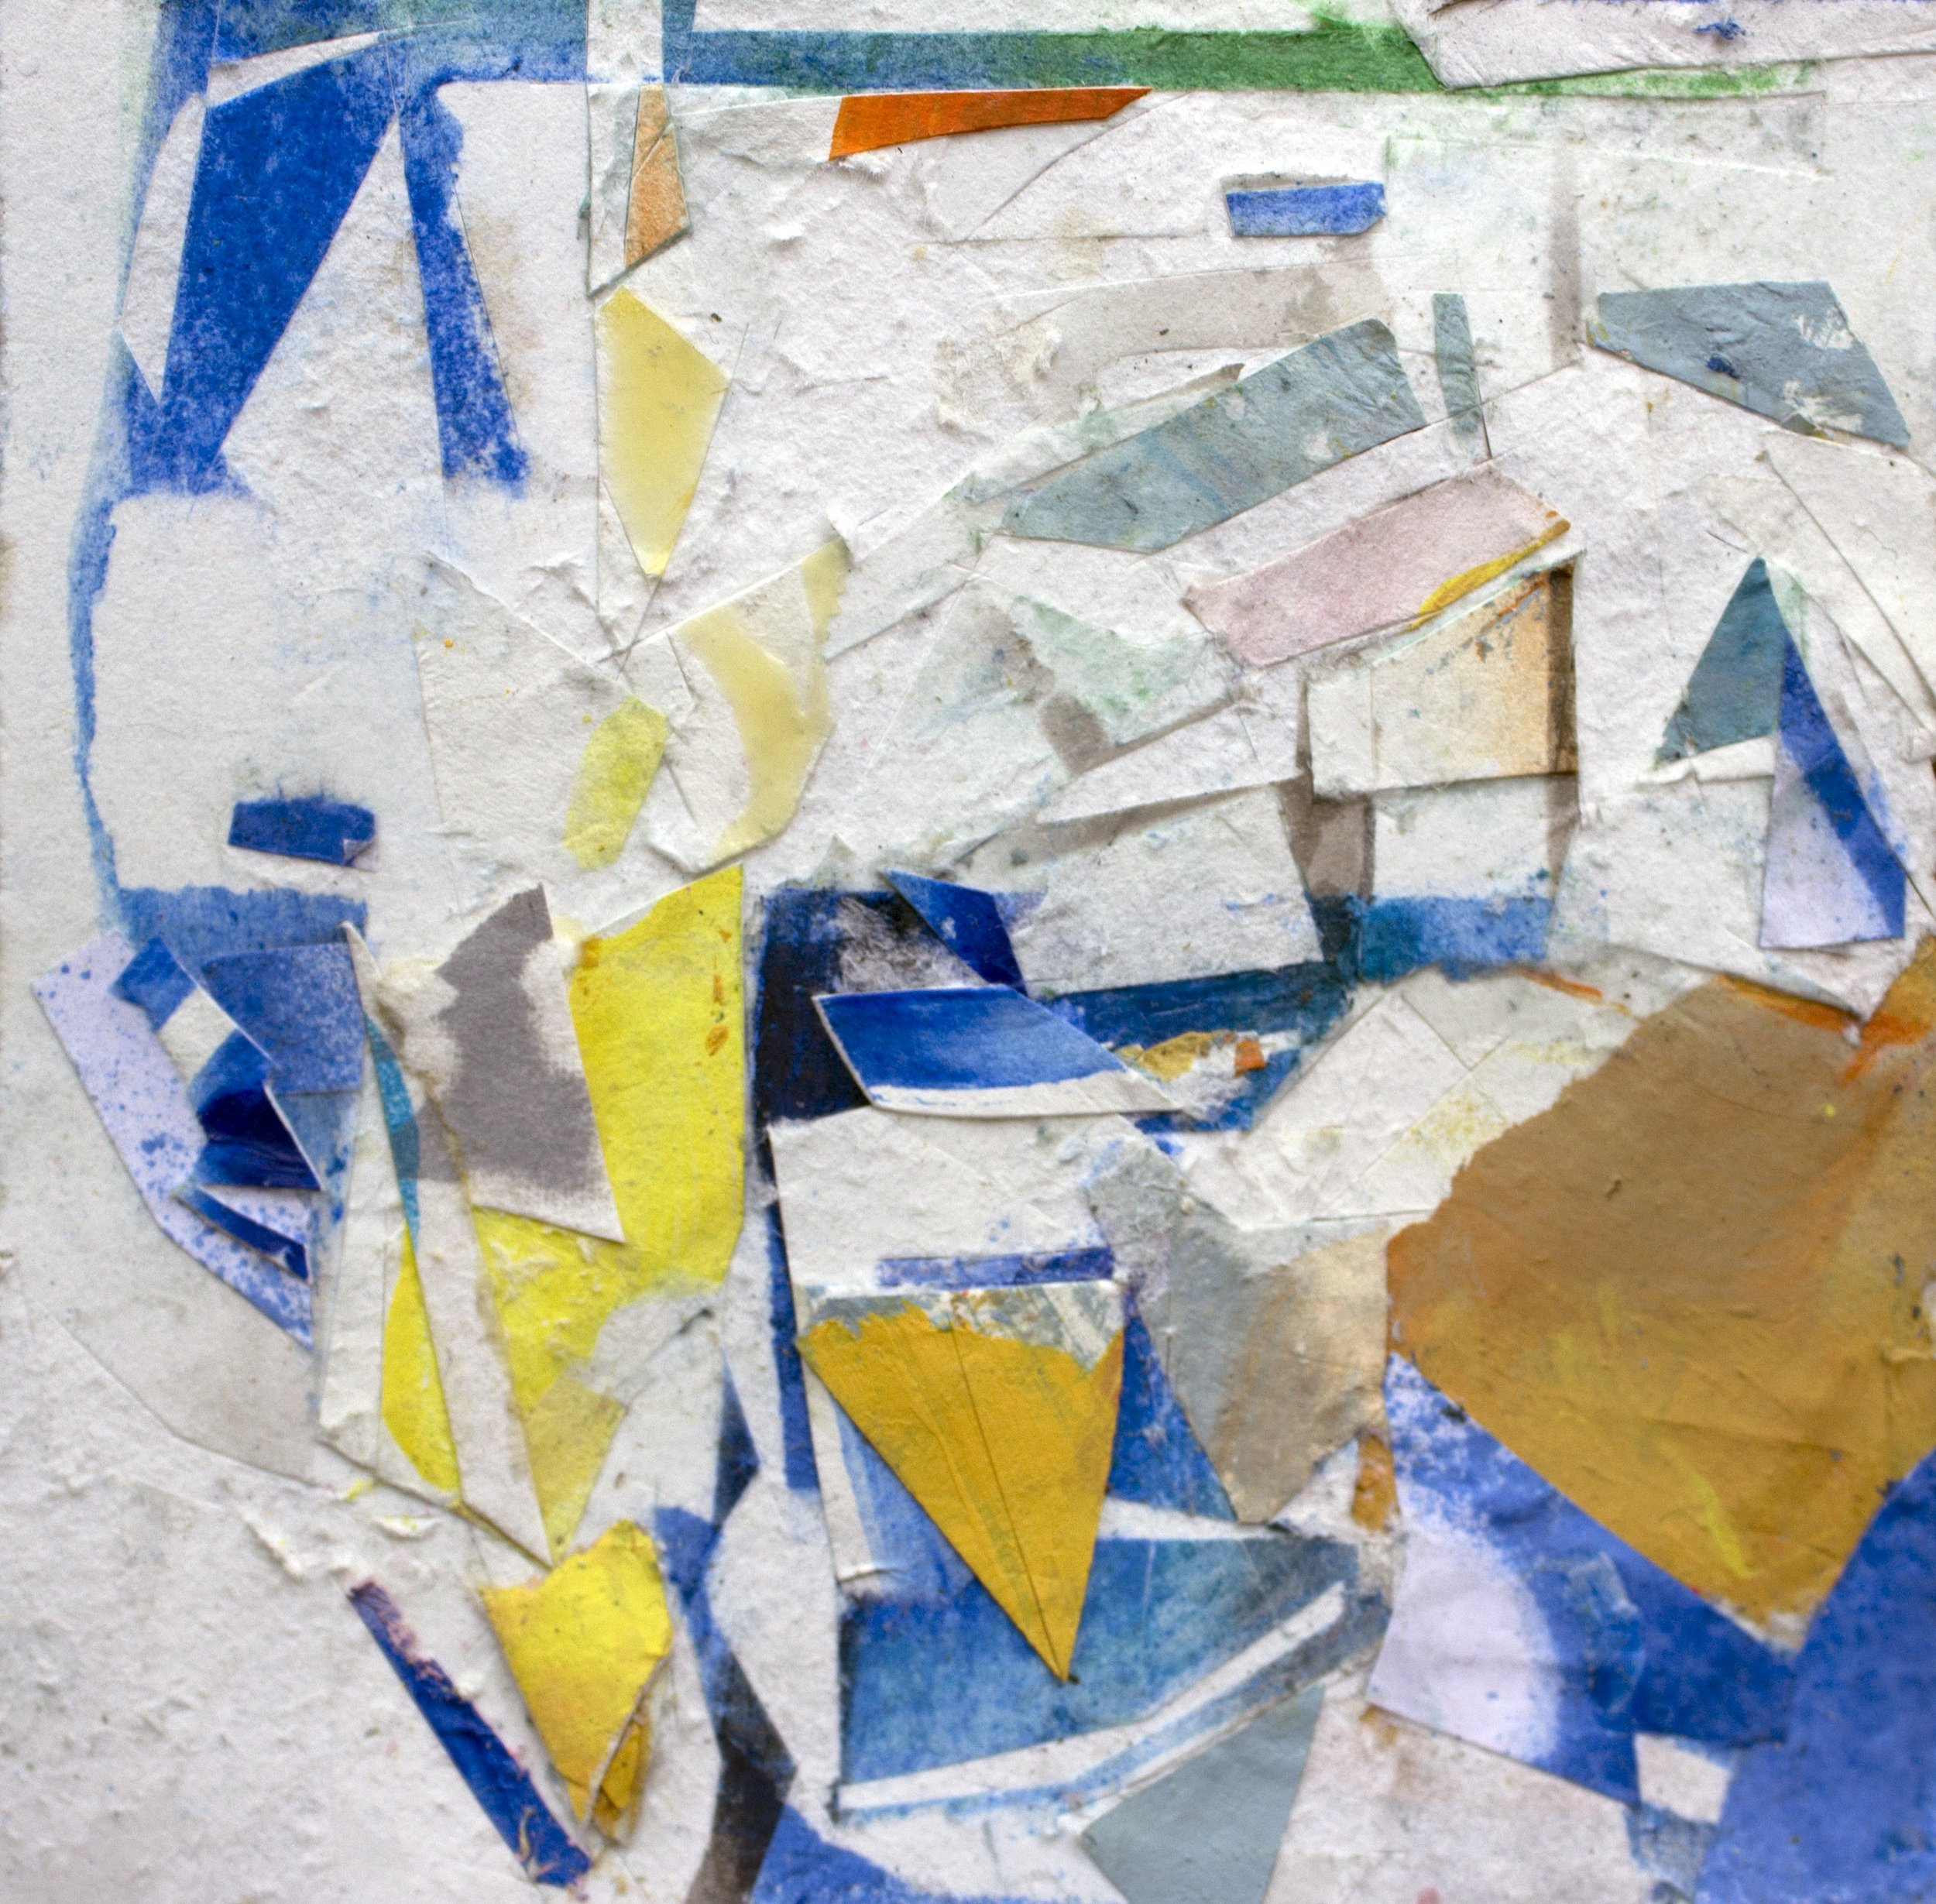 "Rock Naps,4""x4"", Fumage, Pastel, Collage, Latex Paint, 2016"